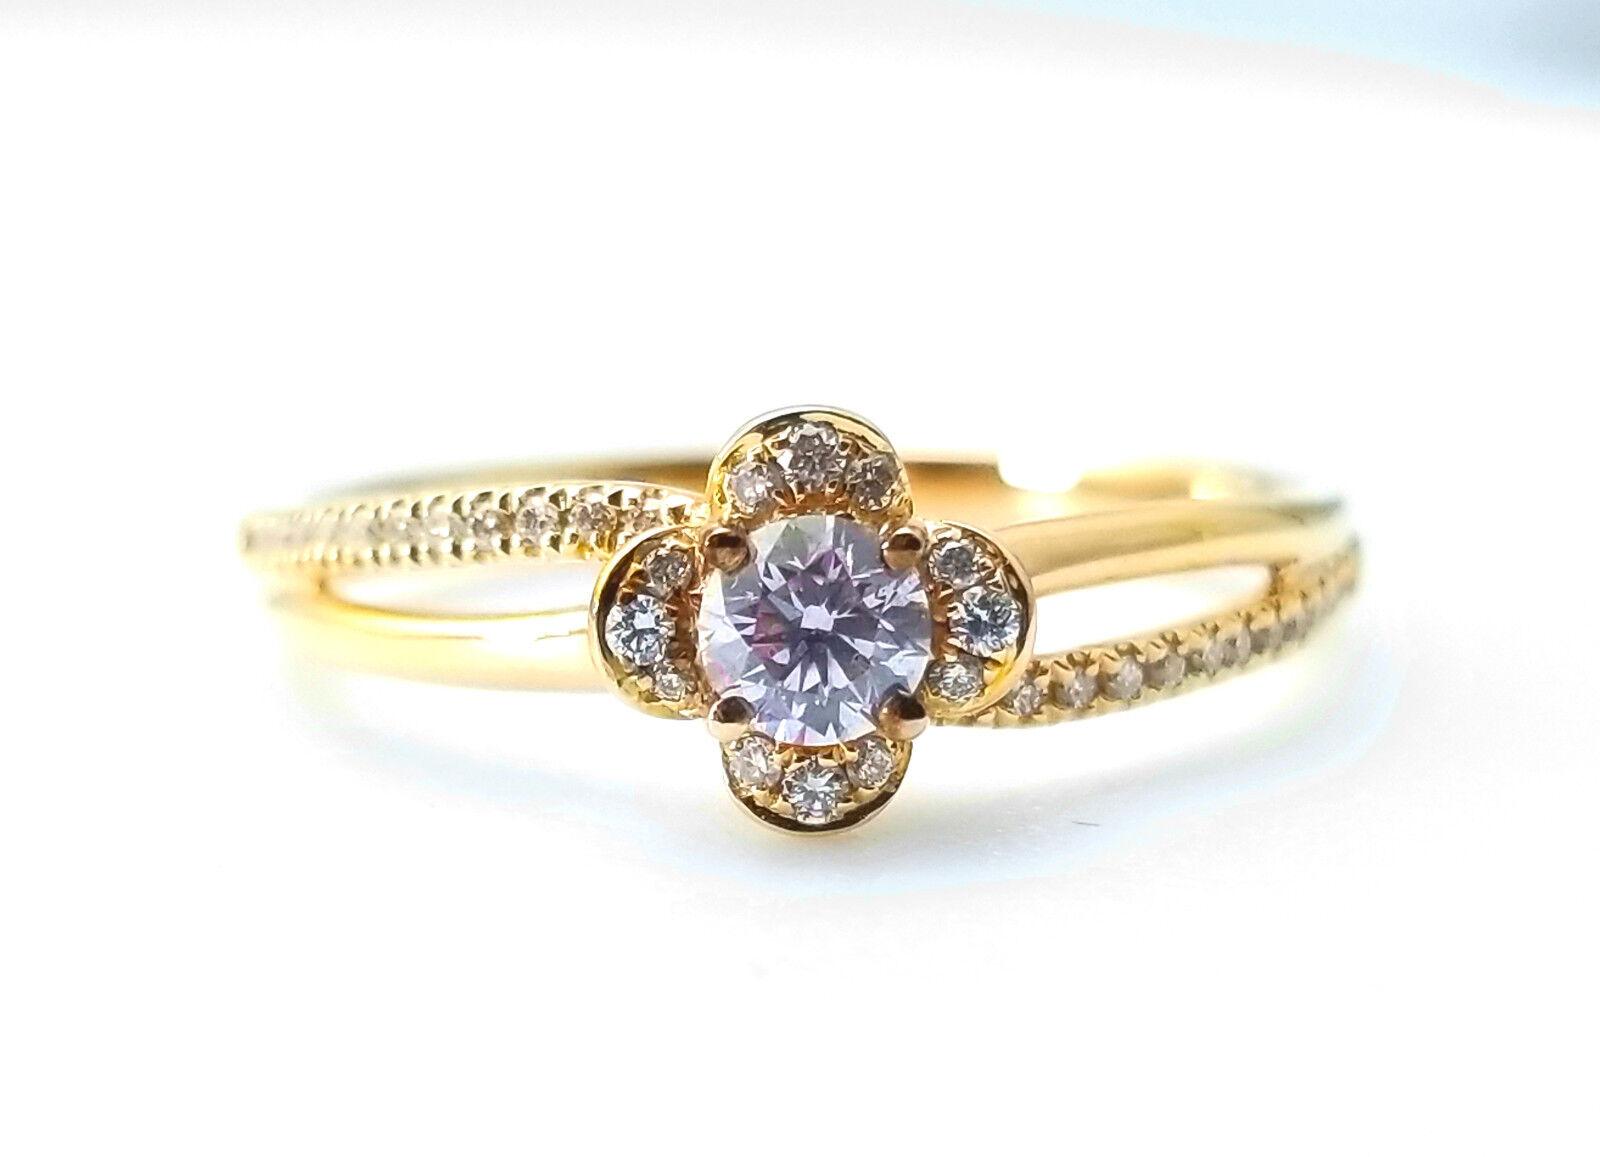 0.46ct Natural Fancy Light Pink Diamonds ARGYLE Engagement Ring GIA Round 18K VS